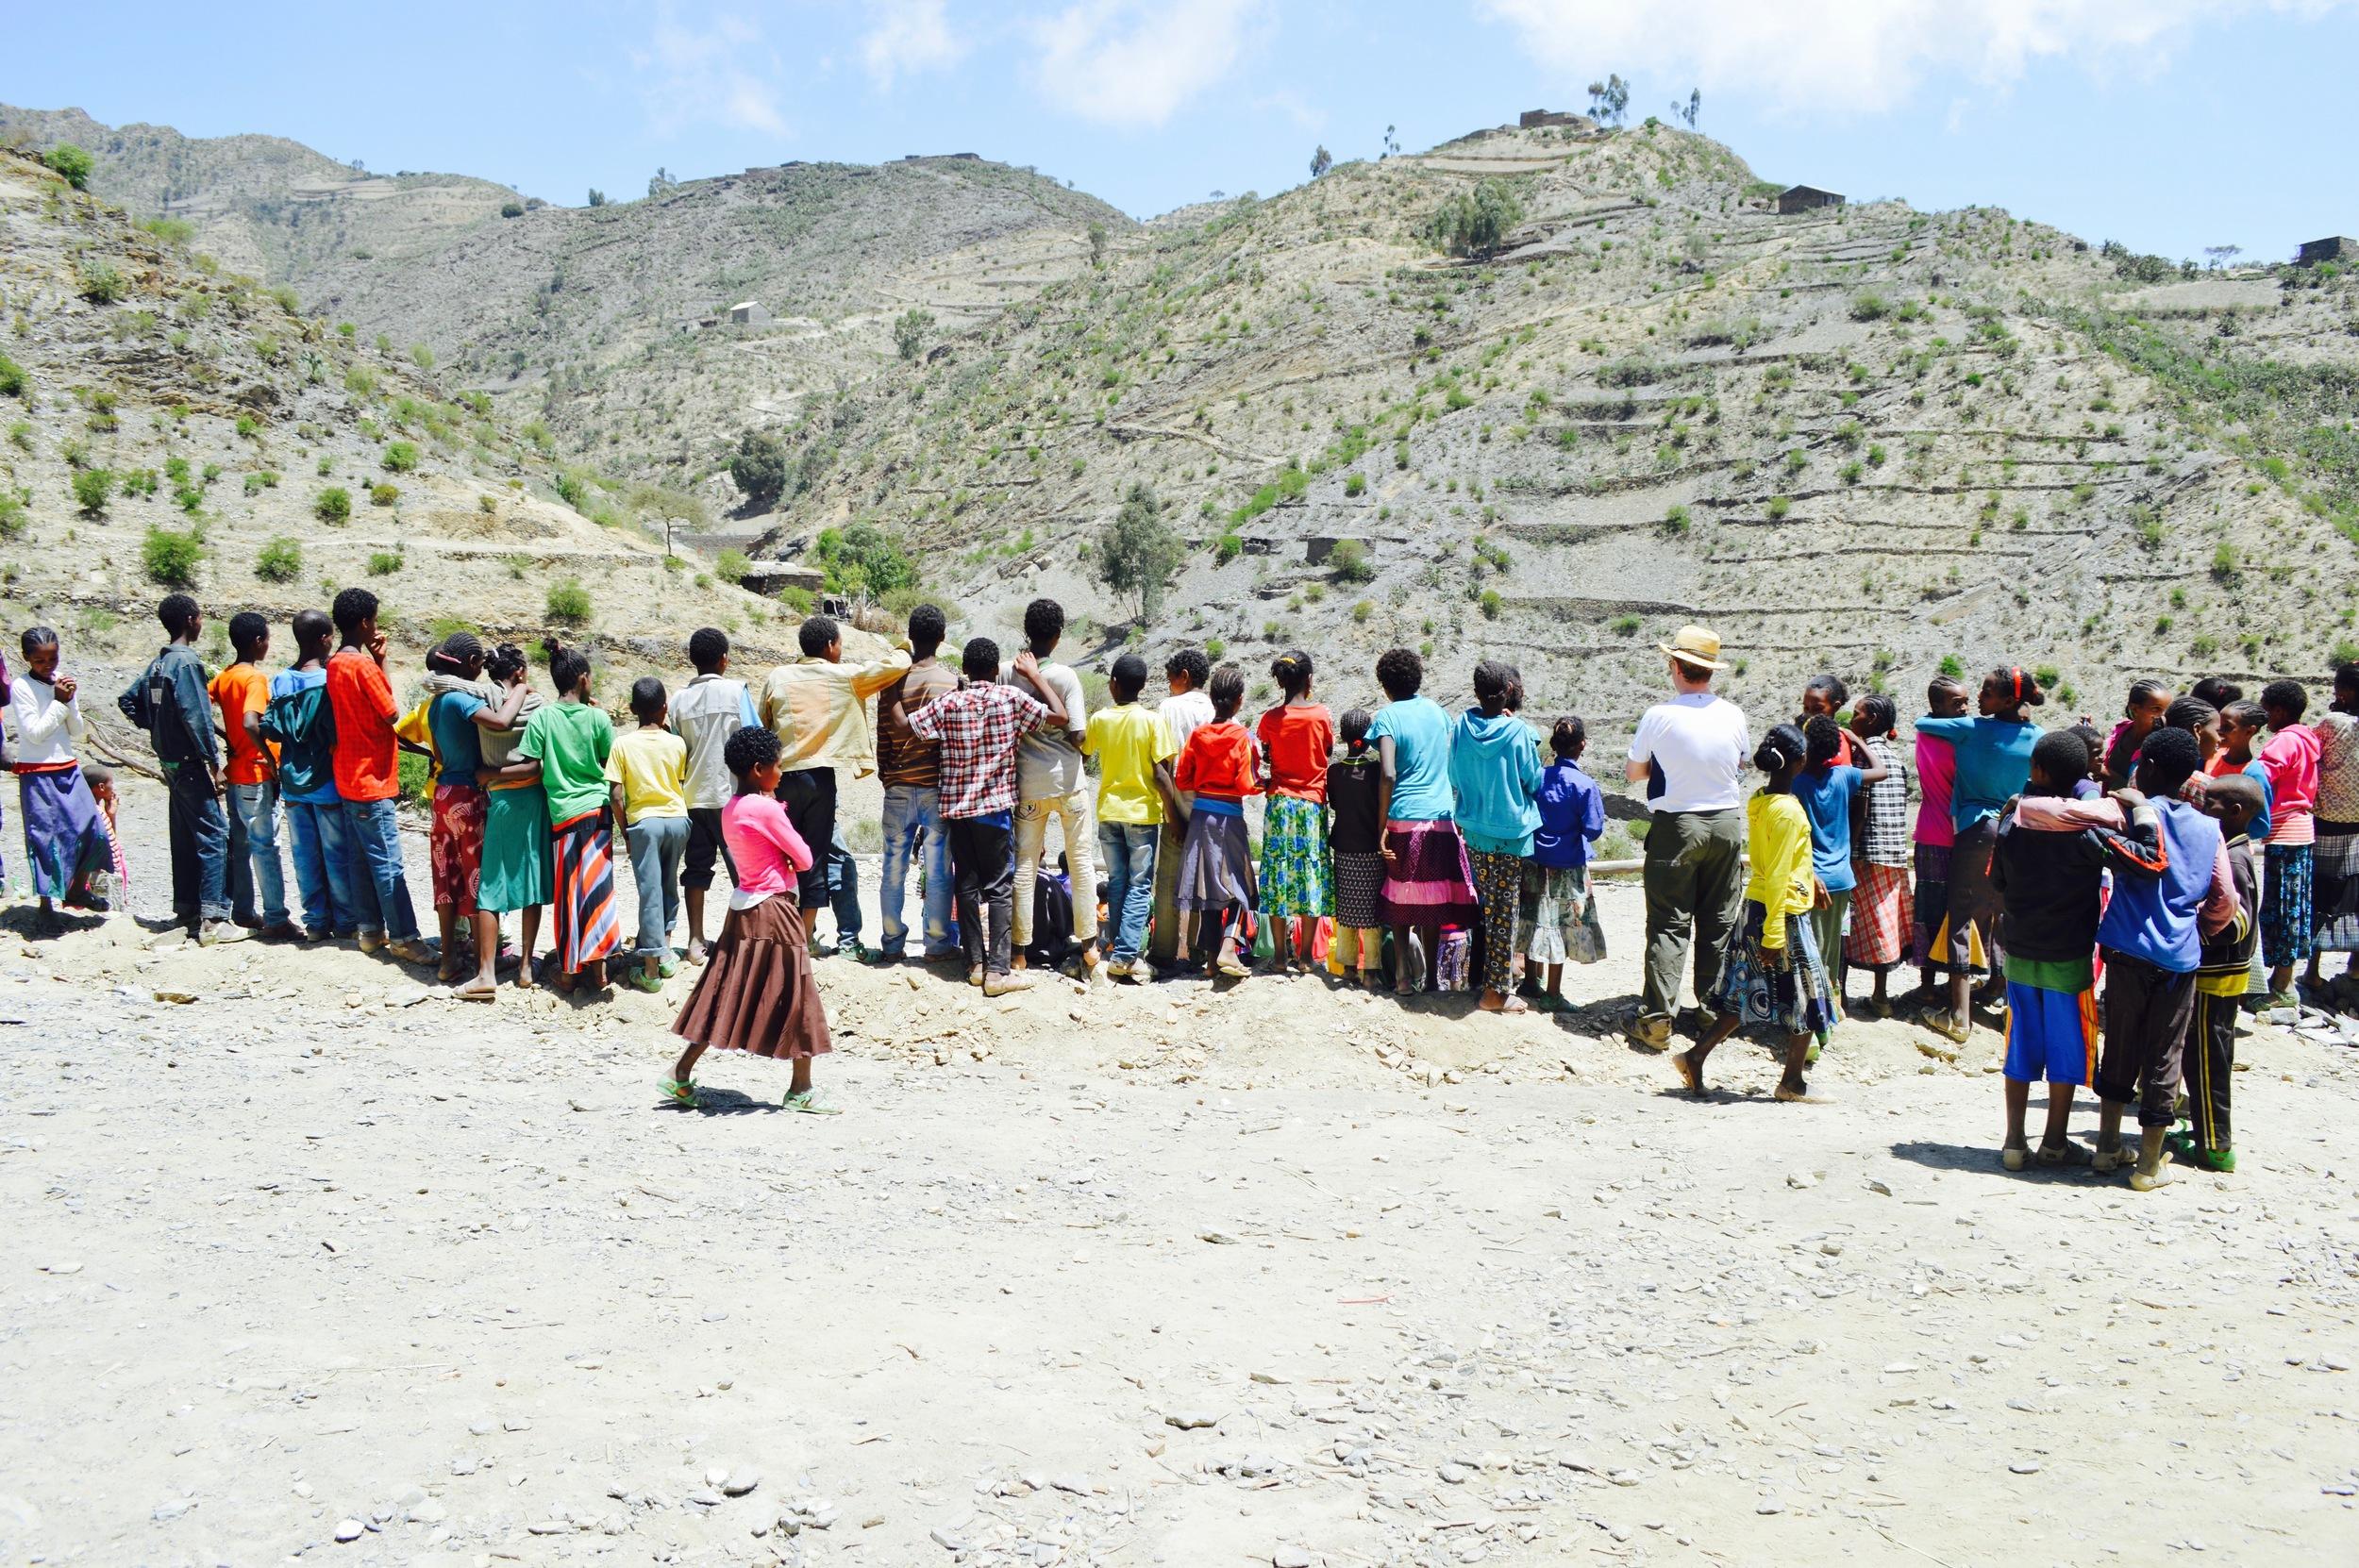 Kidane - Mihret Primary School - Engal   Kindergarden  14 Students  Number of teachers: 2  Cost per student: $128/£98